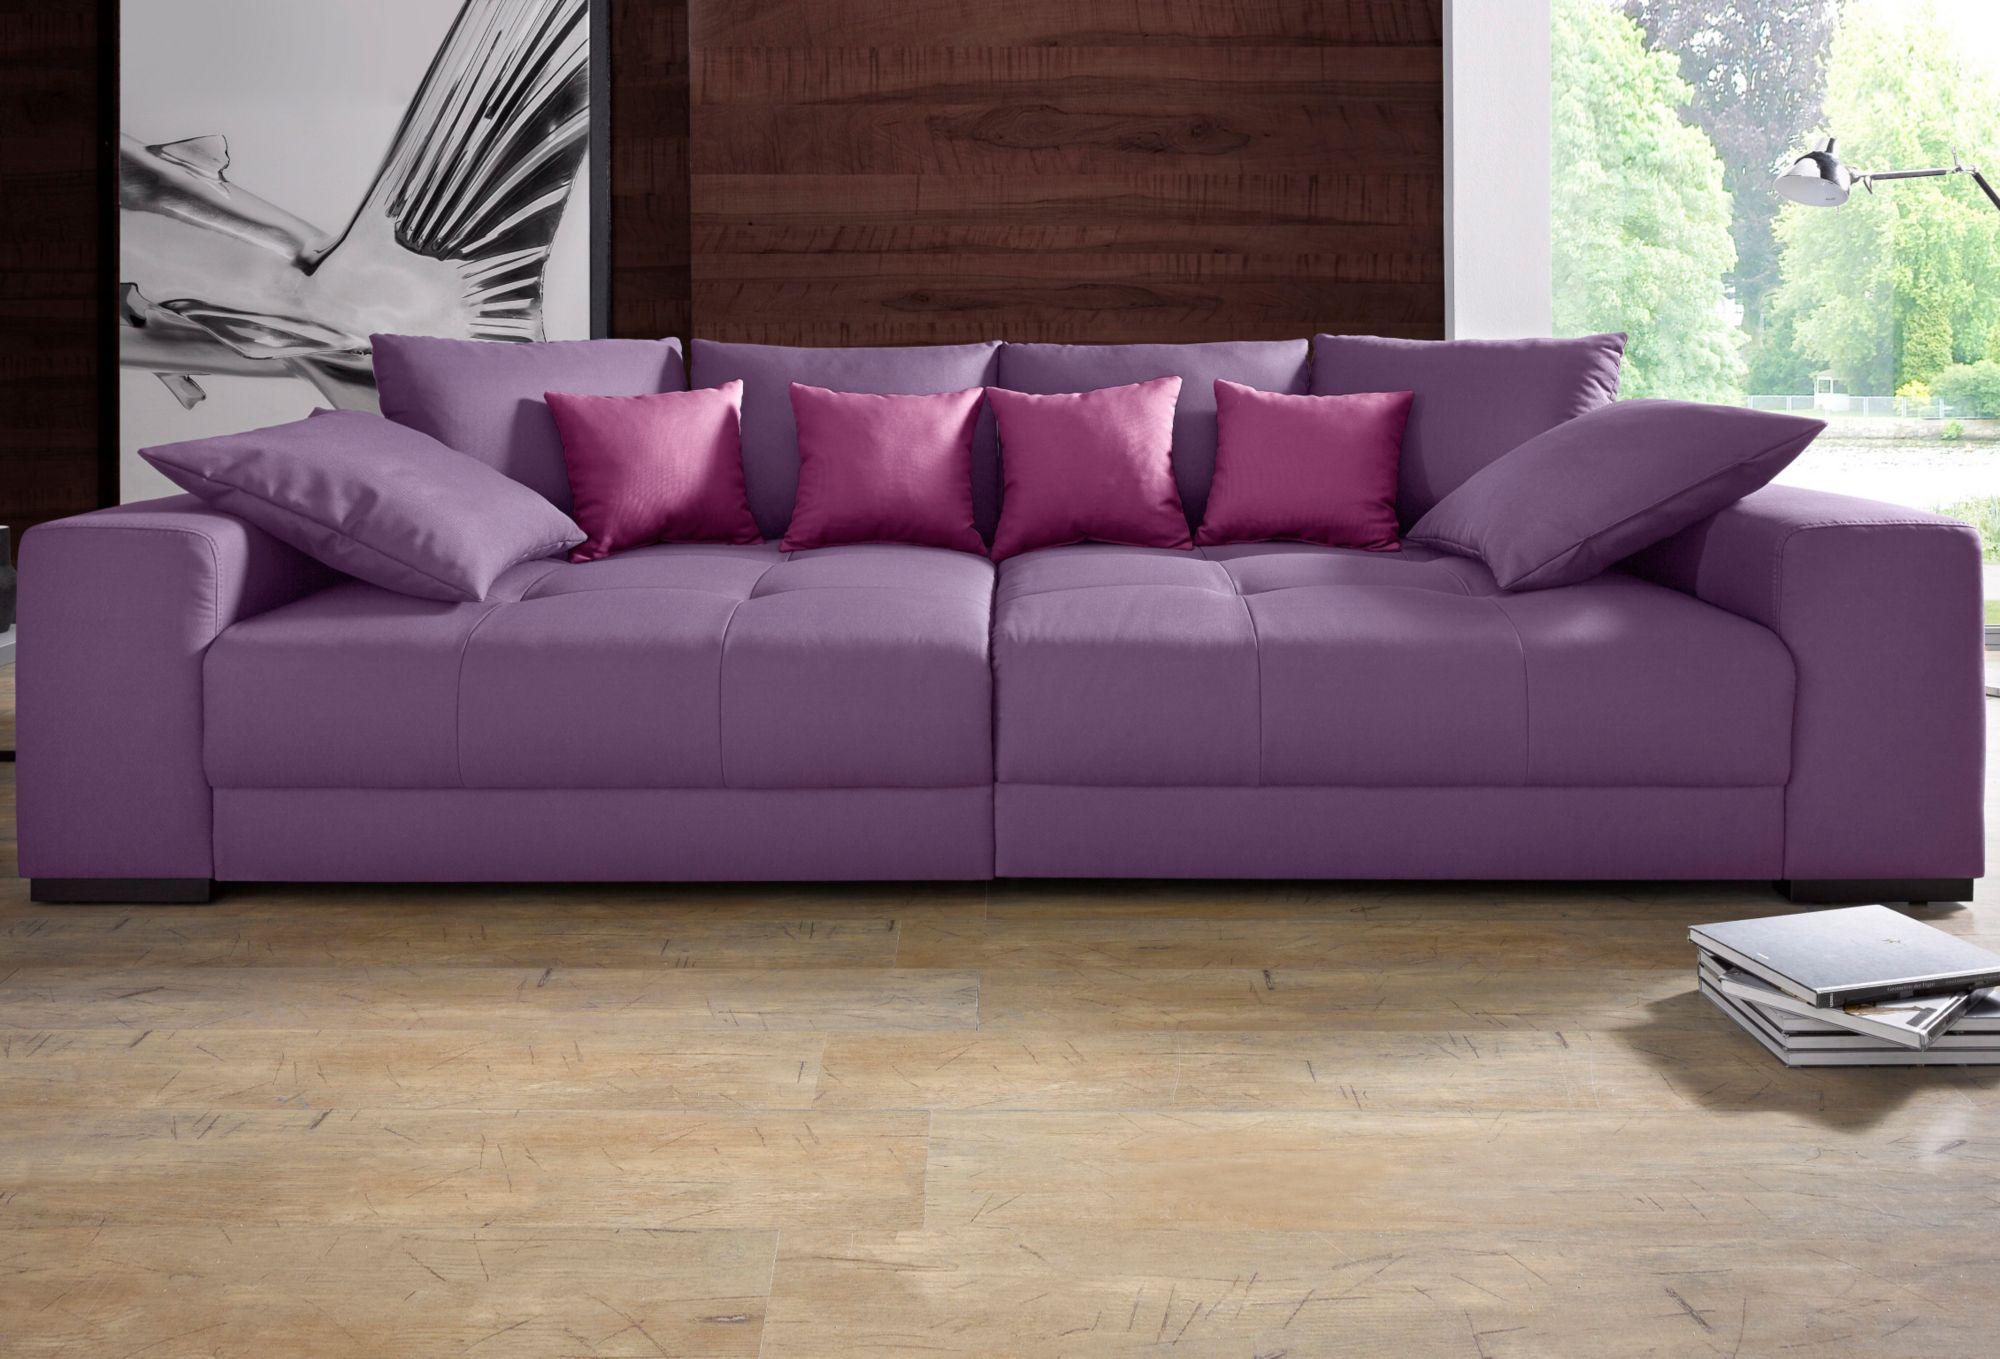 xxl sofas im schwab online shop m bel sofas couches. Black Bedroom Furniture Sets. Home Design Ideas